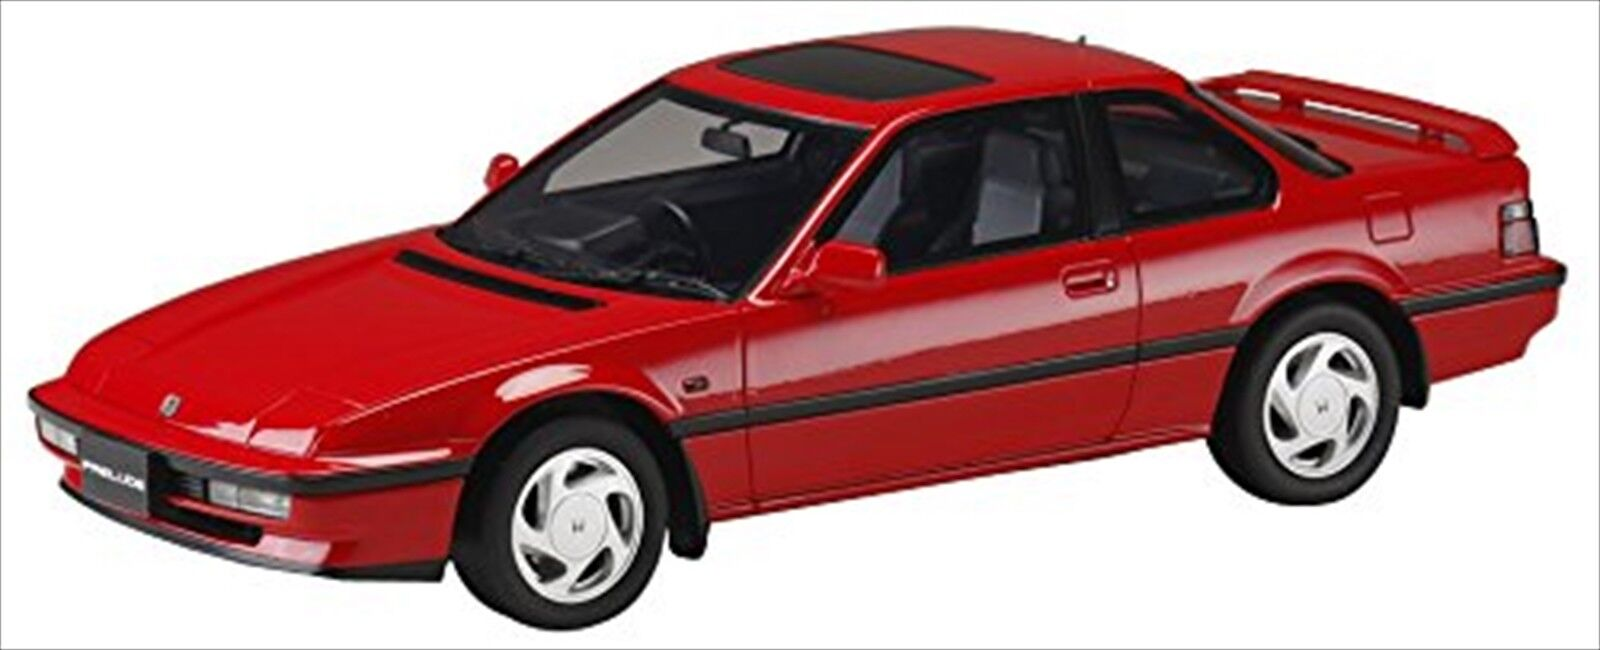 1 18 HONDA Prelude SI BA 5 si 1989 Phoenix Rouge Résine Modèle Hj1804R Hobby Japan